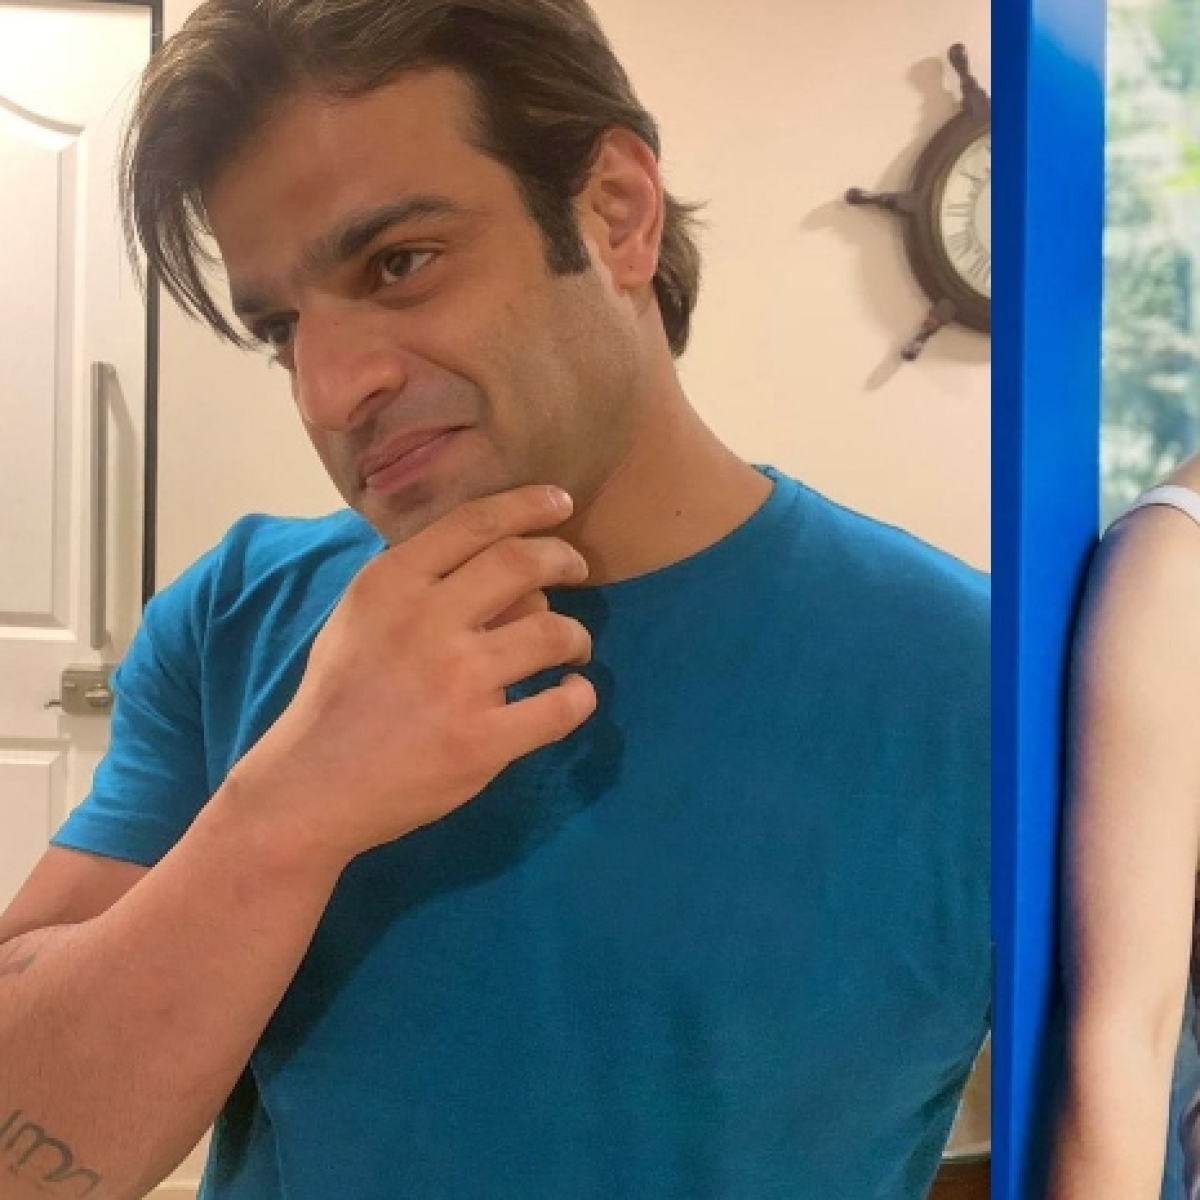 Karan Patel mocks Kangana Ranaut's old tweet, calls her 'most hilarious stand-up comedian'